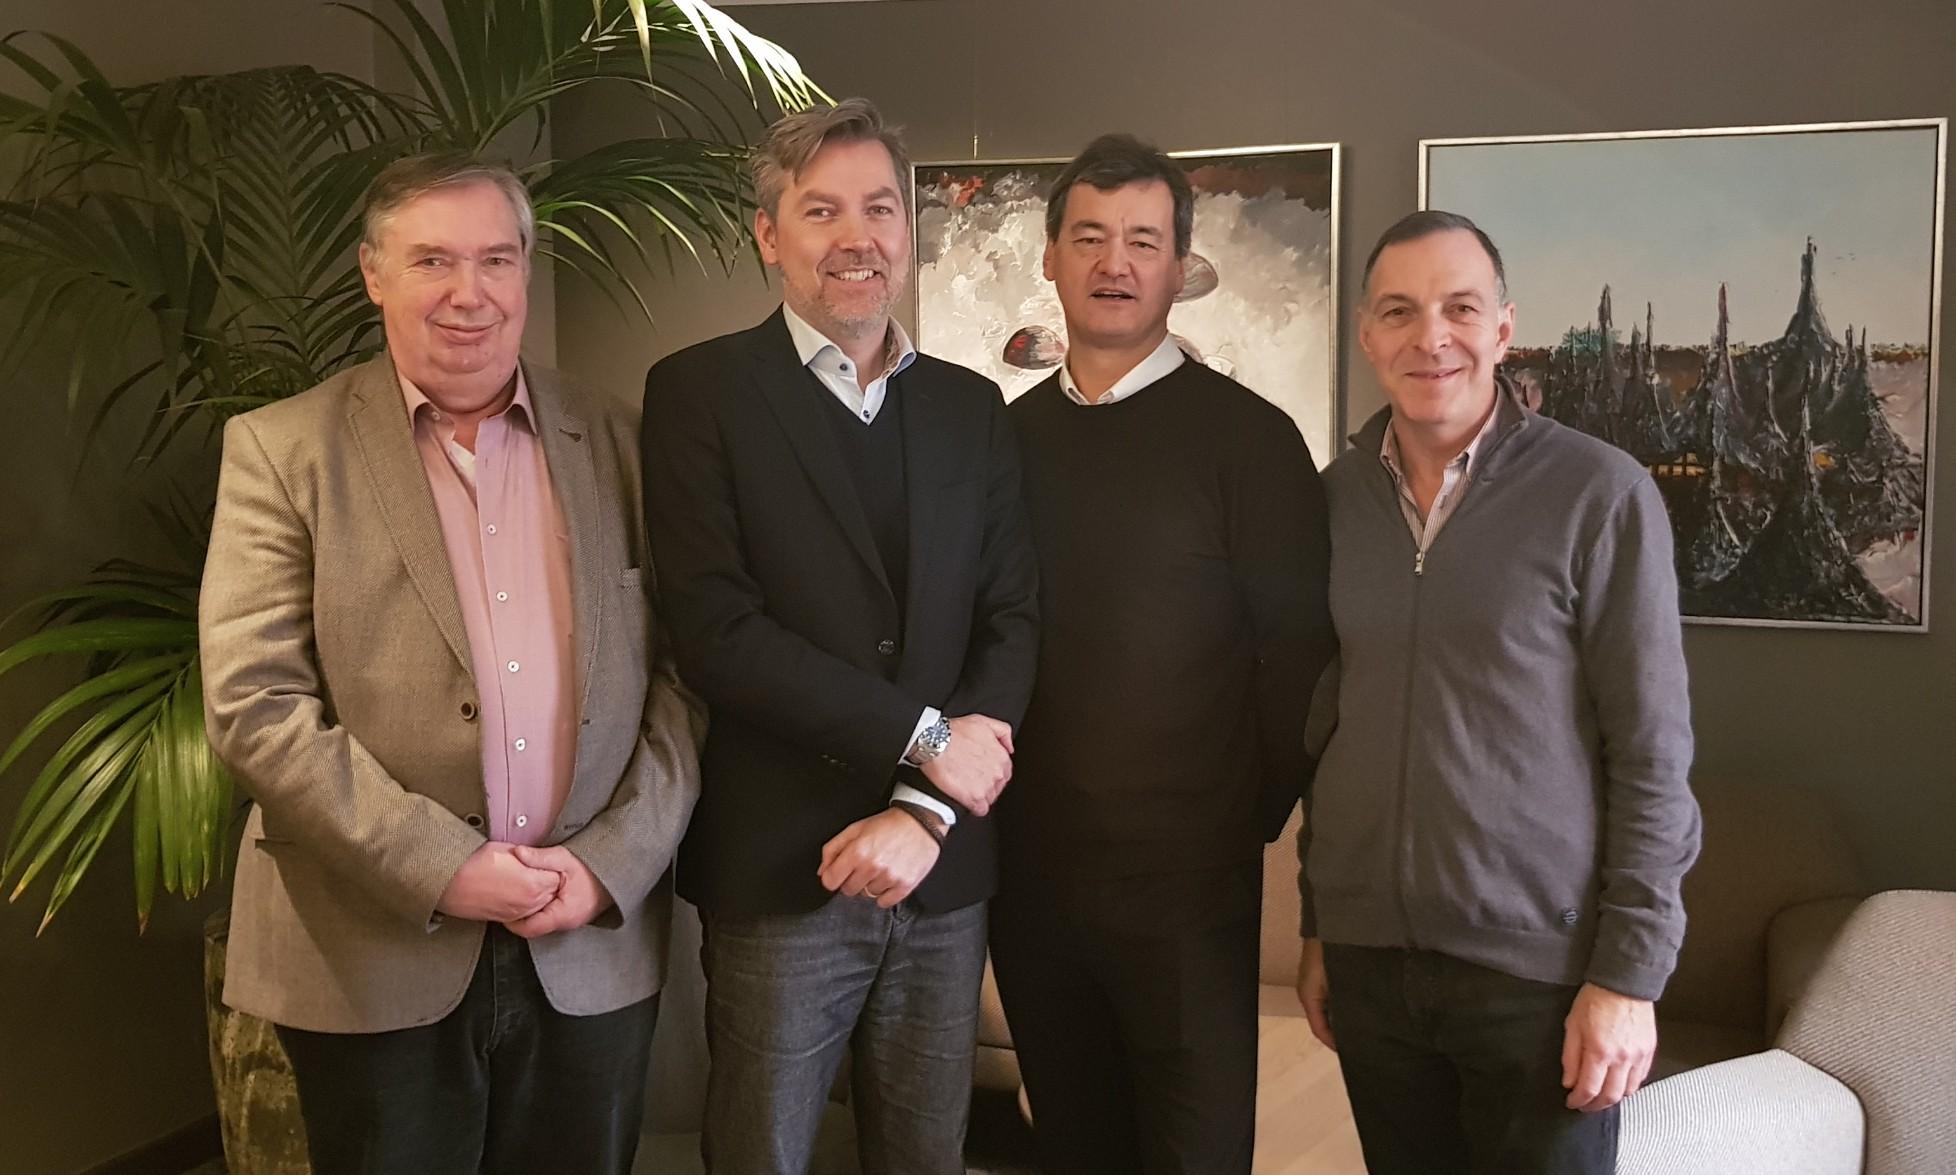 Bestyrelsen for BARID – Board of Airline Representatives In Denmark; fra venstre Per Levring, Morten Balk fra Emirates, Marc Sam fra Air Canada og den nyvalgte formand, Patrick Menzies. Foto: BARID.